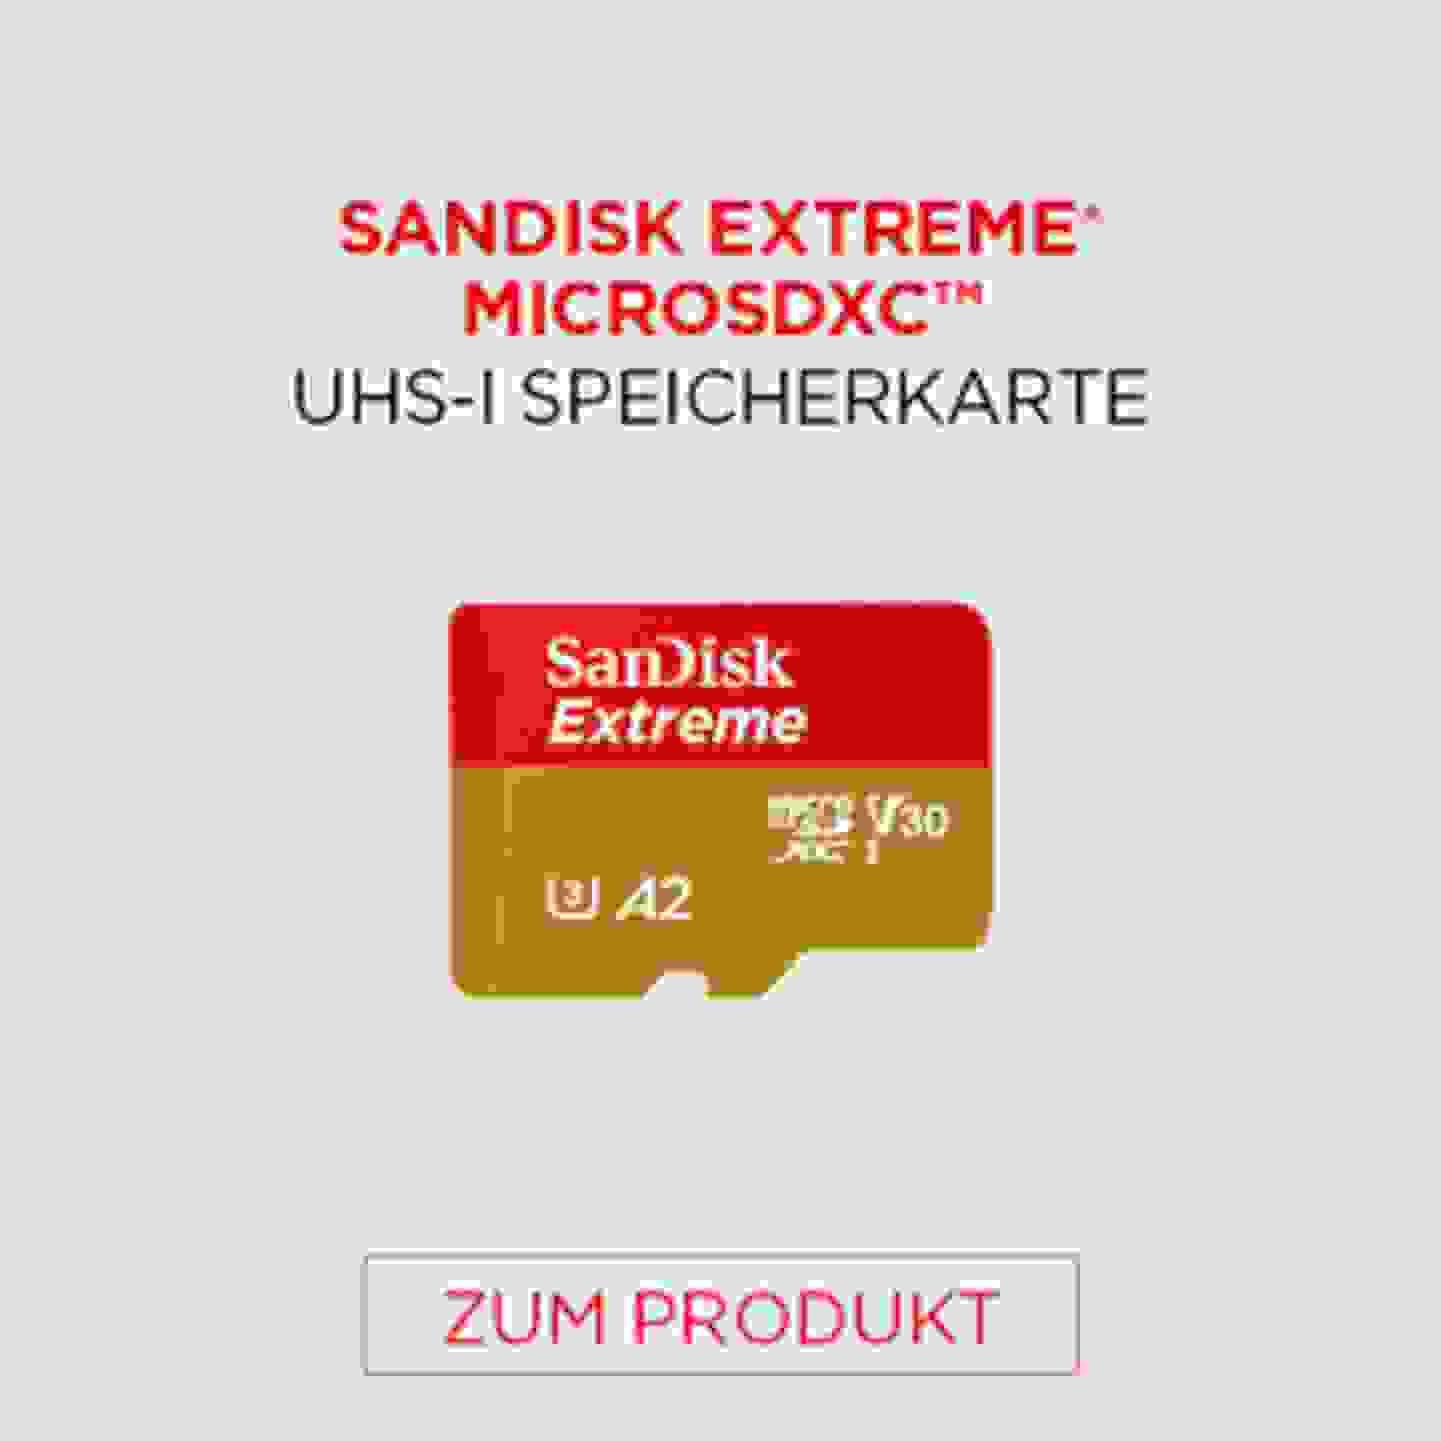 Sandisk Extreme MICROSDXC UHS-I Speicherkarte